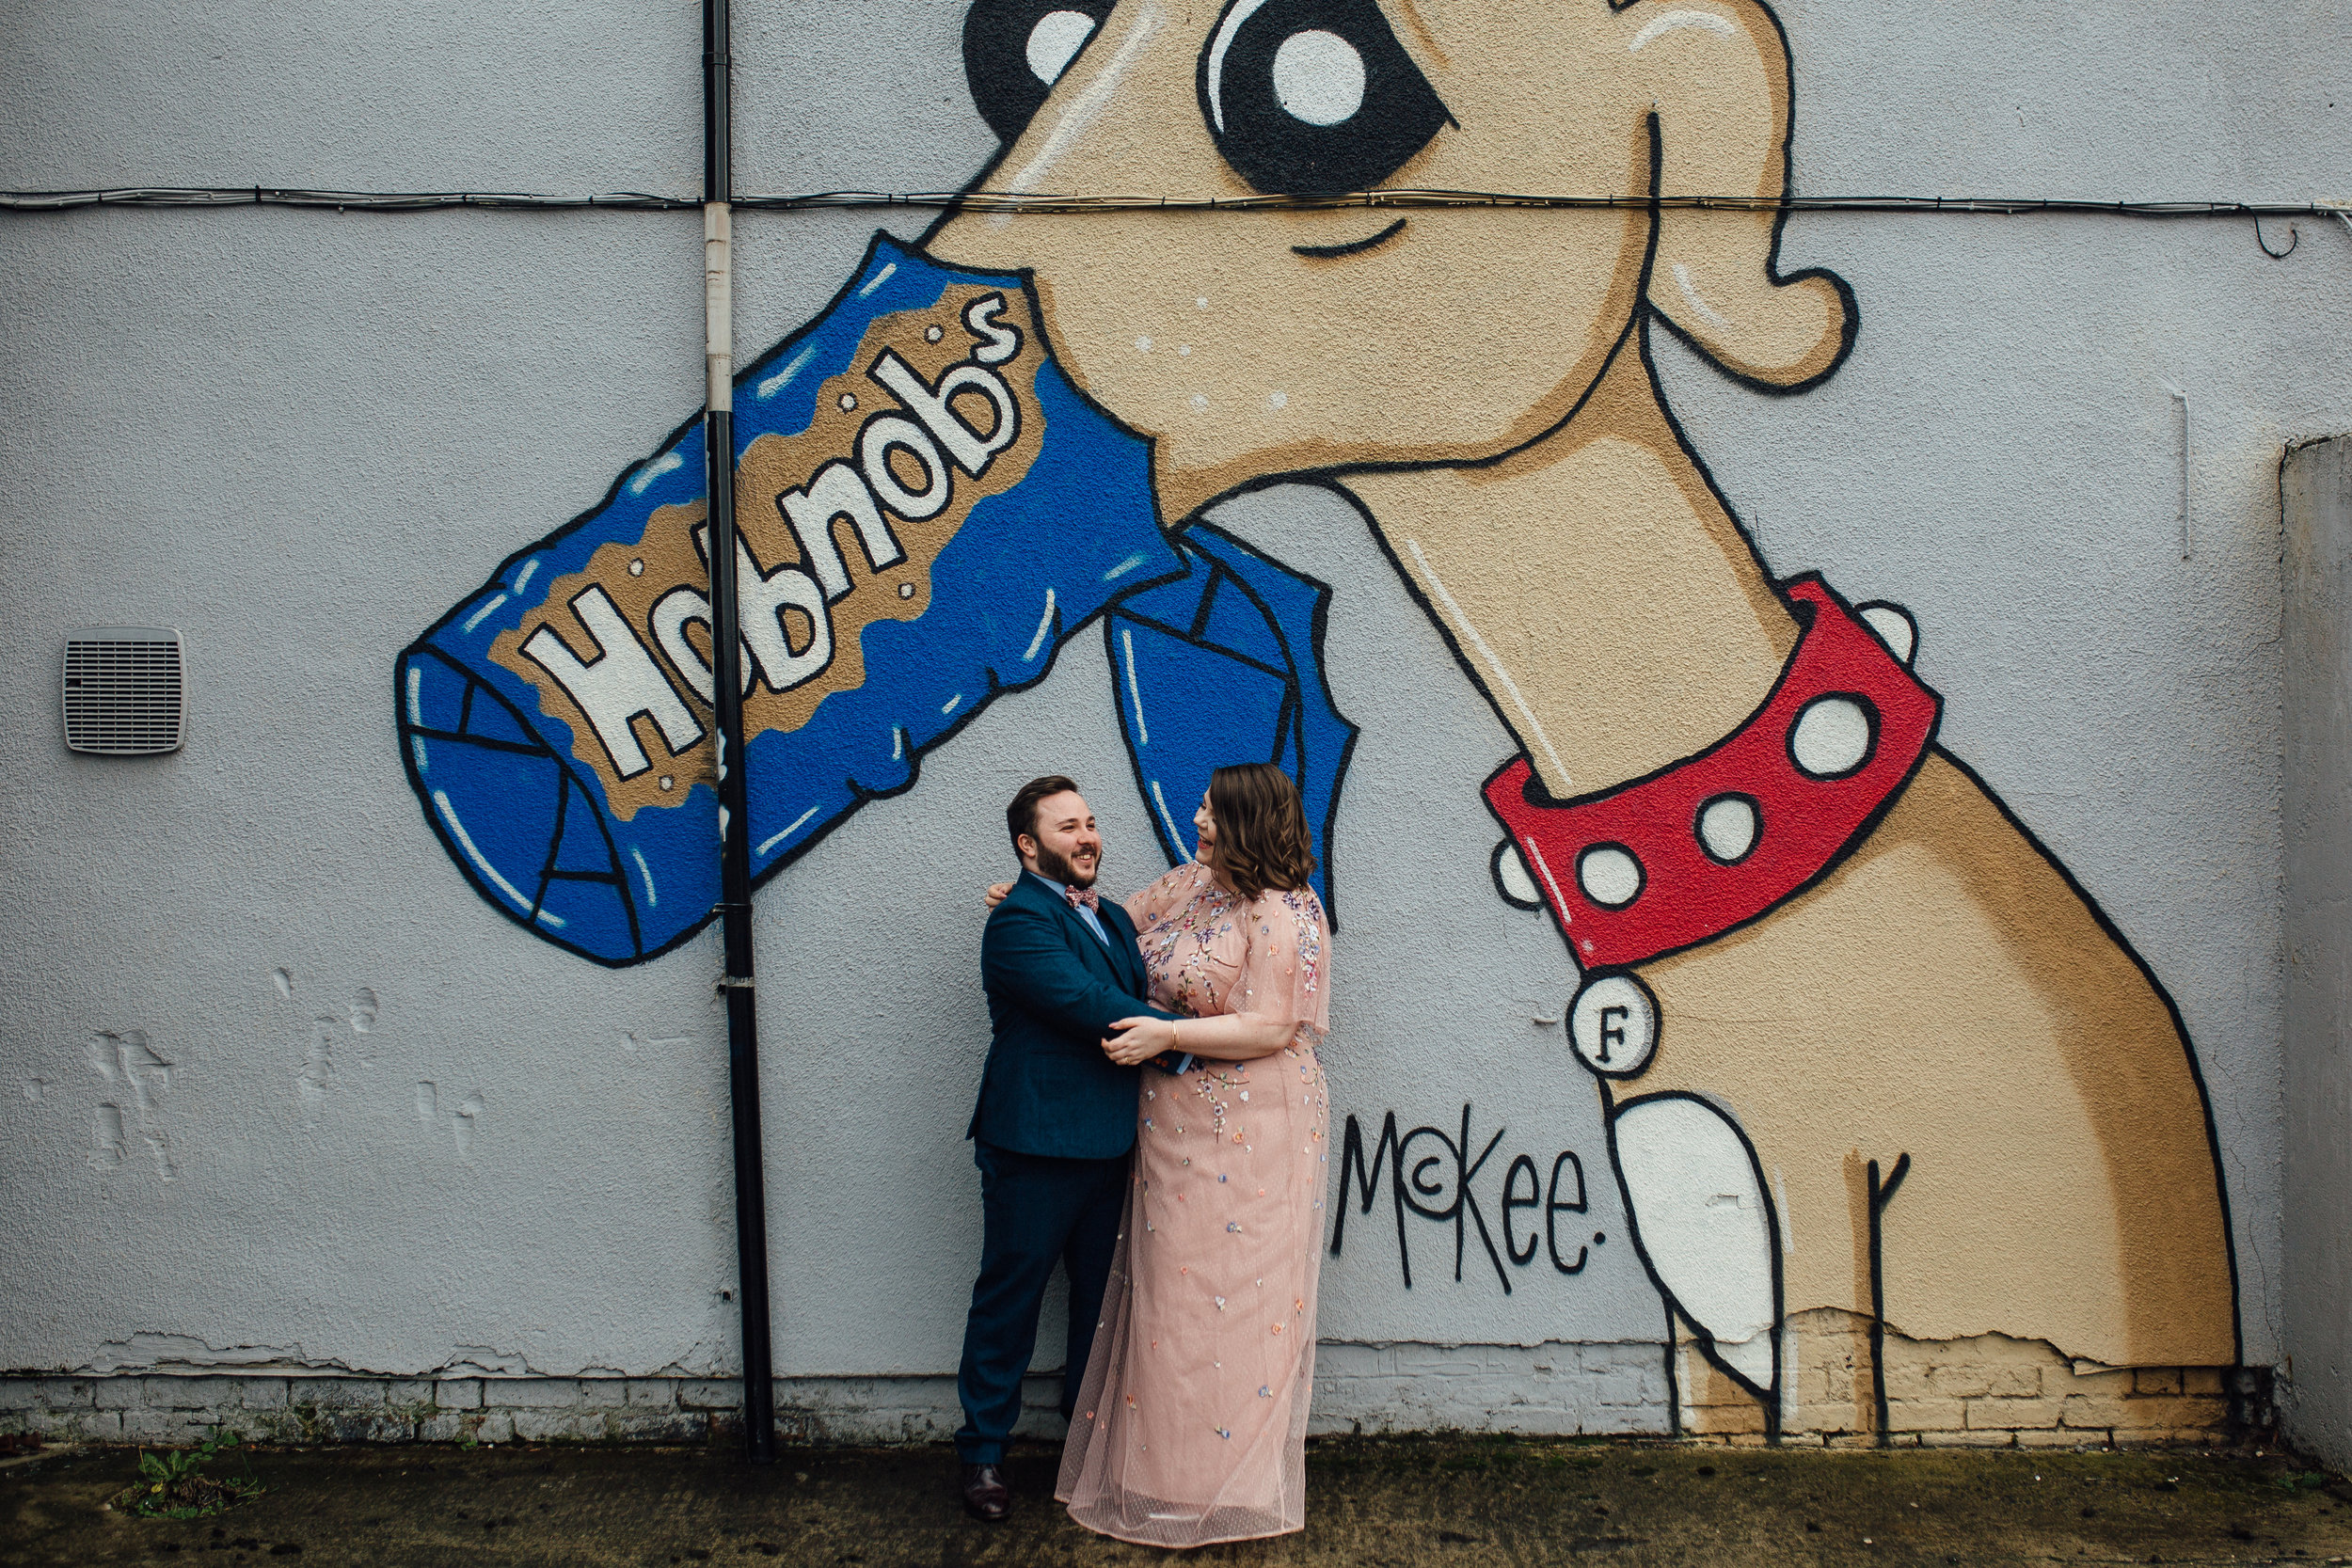 Sheffield Wedding Photographer Dogs at Weddings Frank Pete Mckee